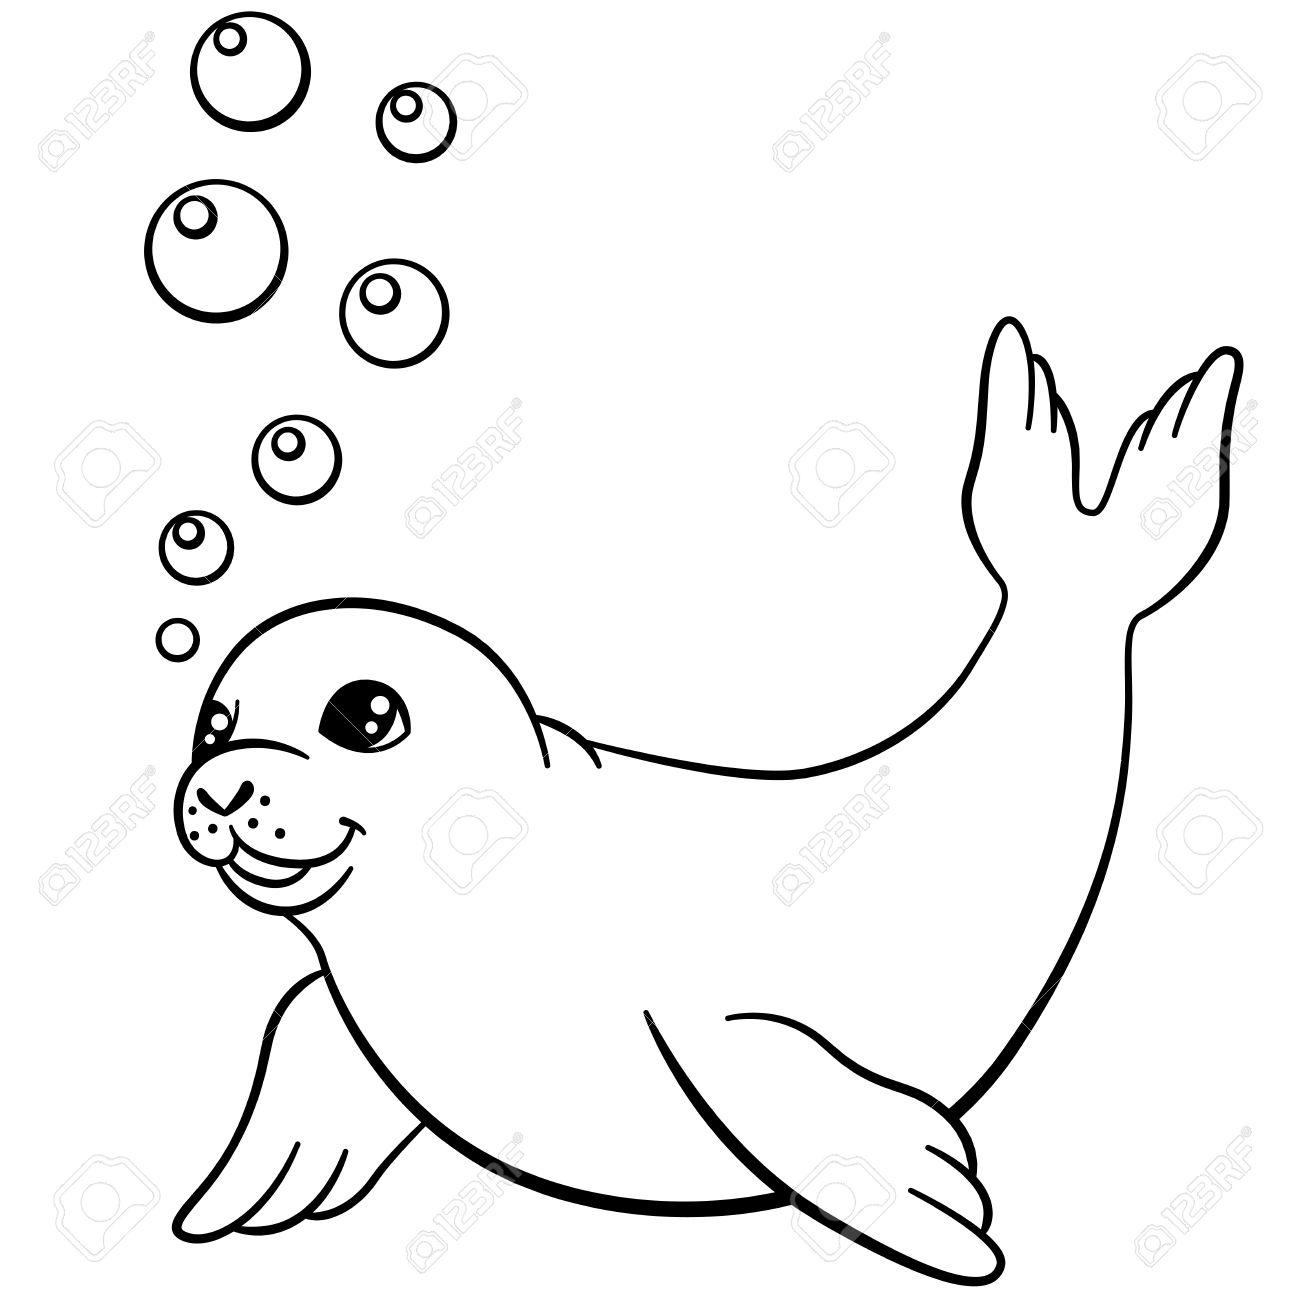 Caballitos De Mar Imagenes Buscar Con Google Dibujos Caballitos De Mar Foca